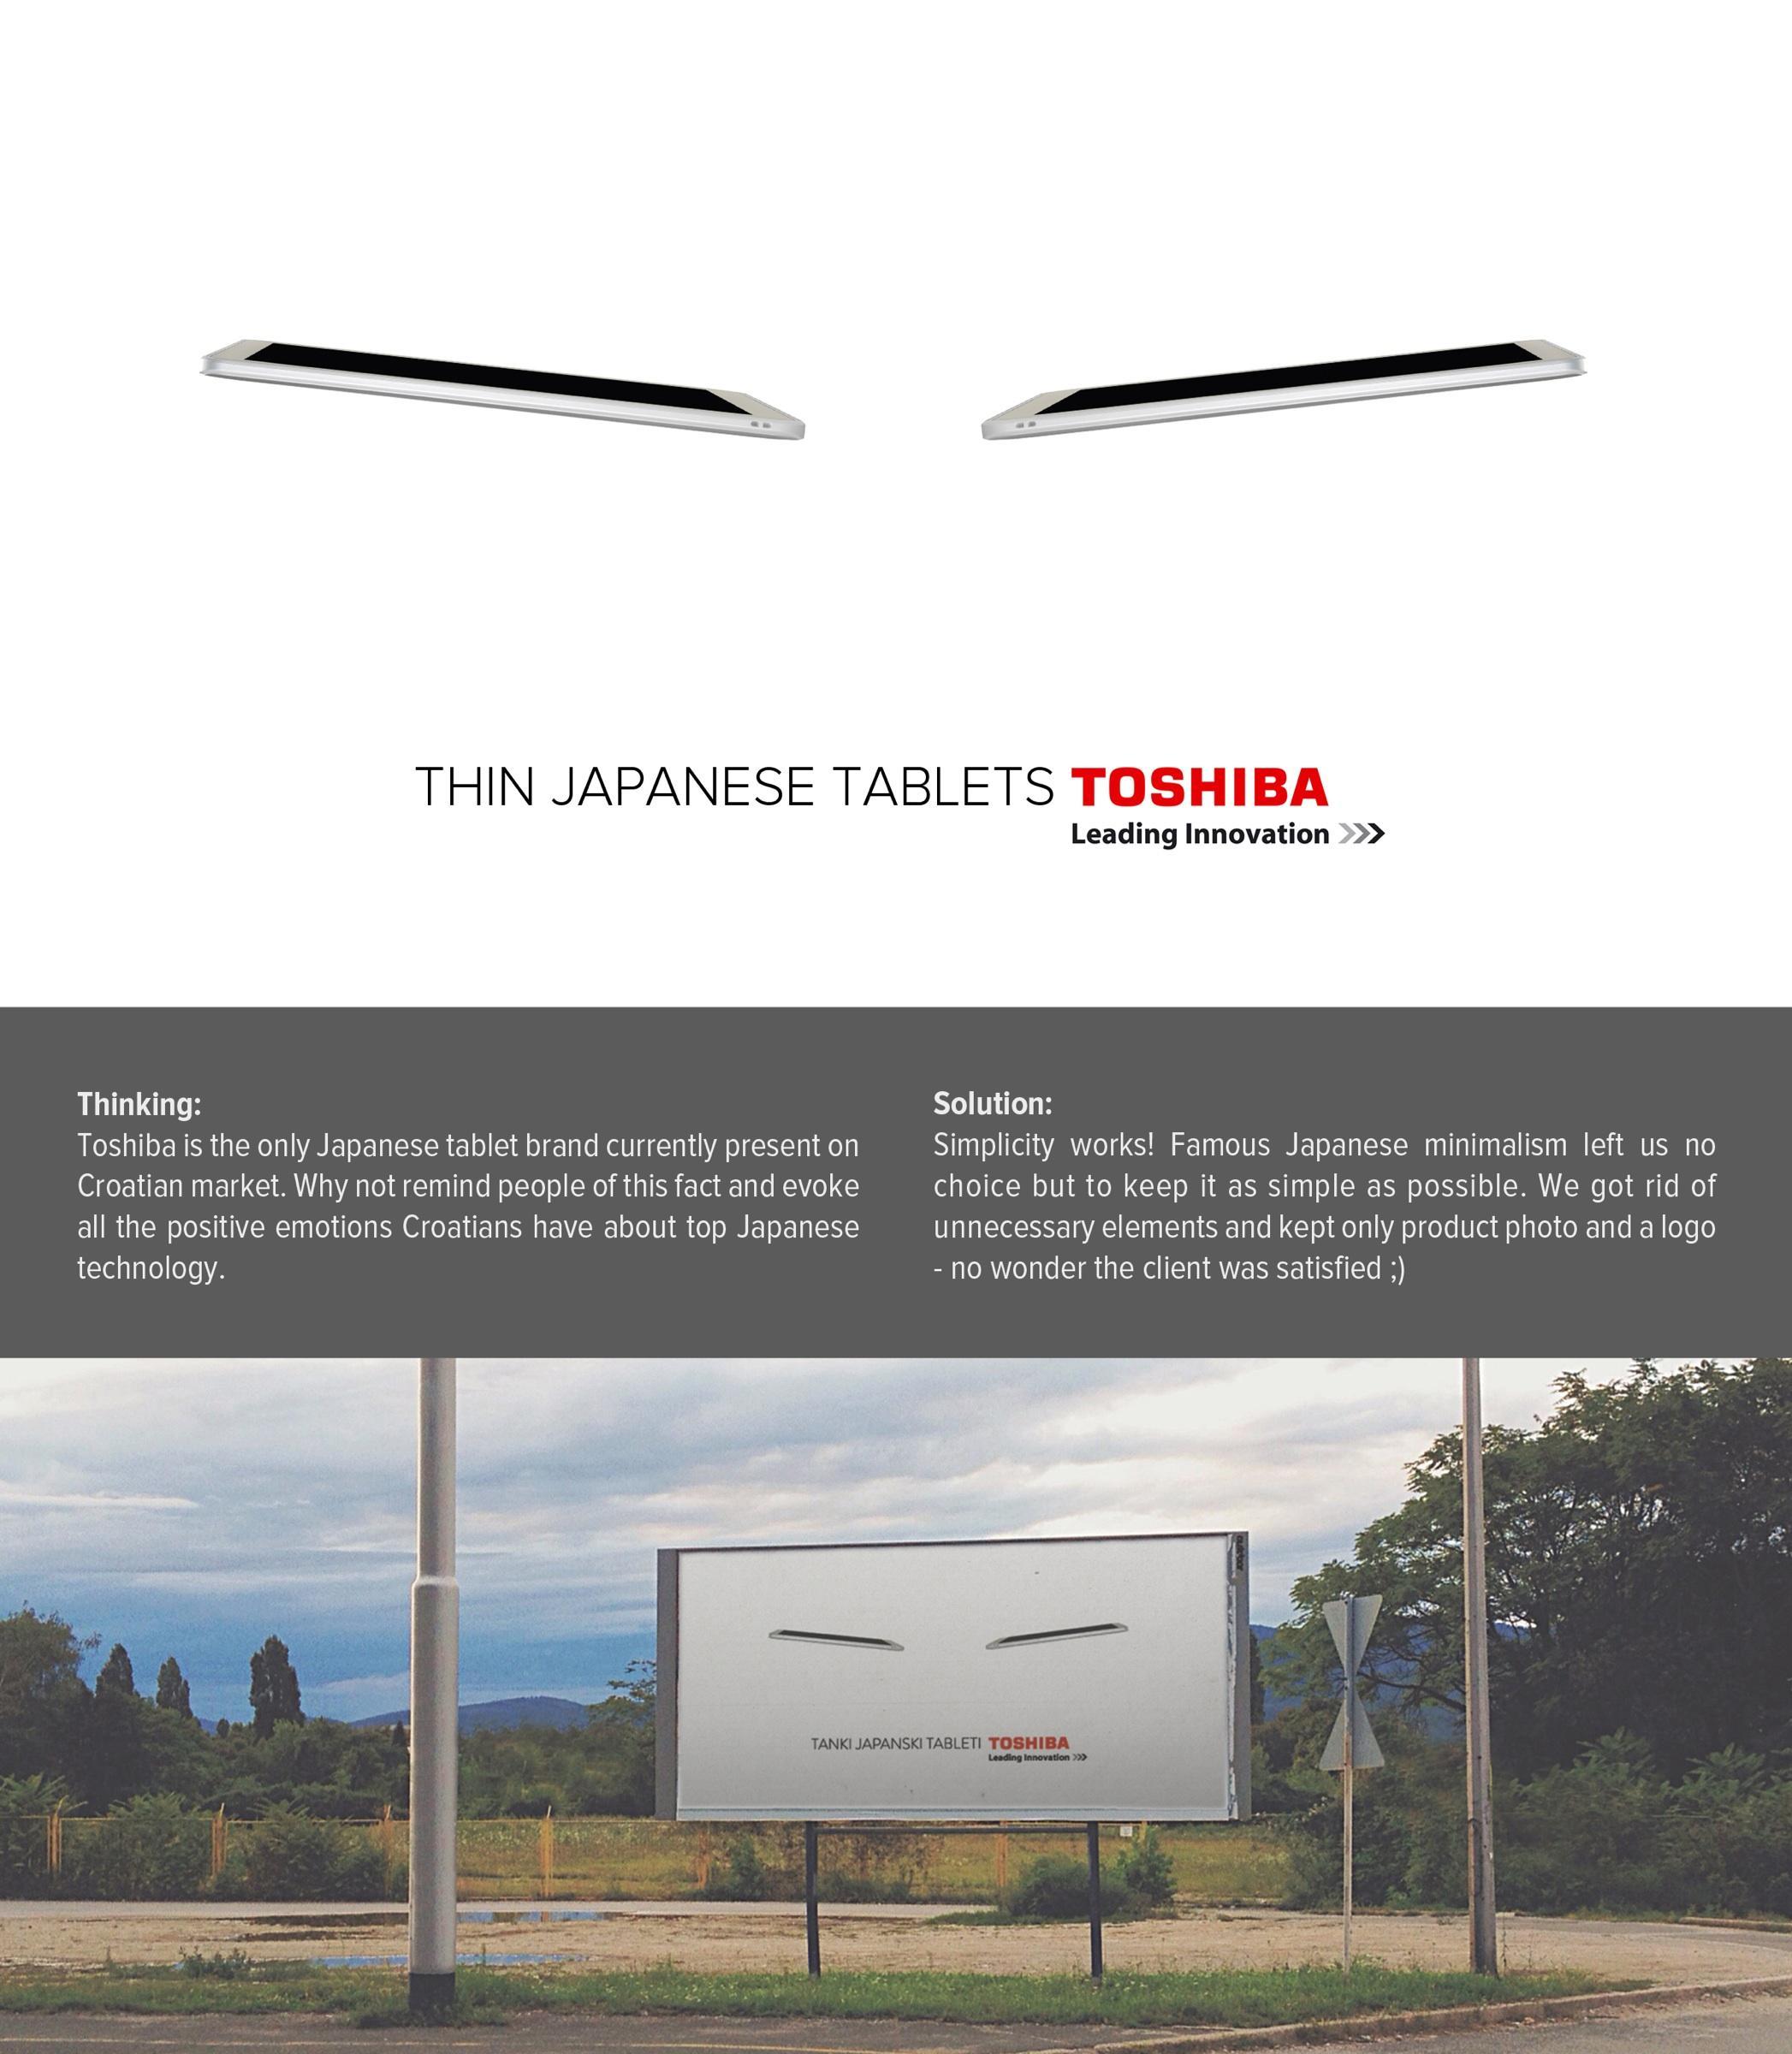 Toshiba Outdoor Ad -  Very thin Japanese tablets